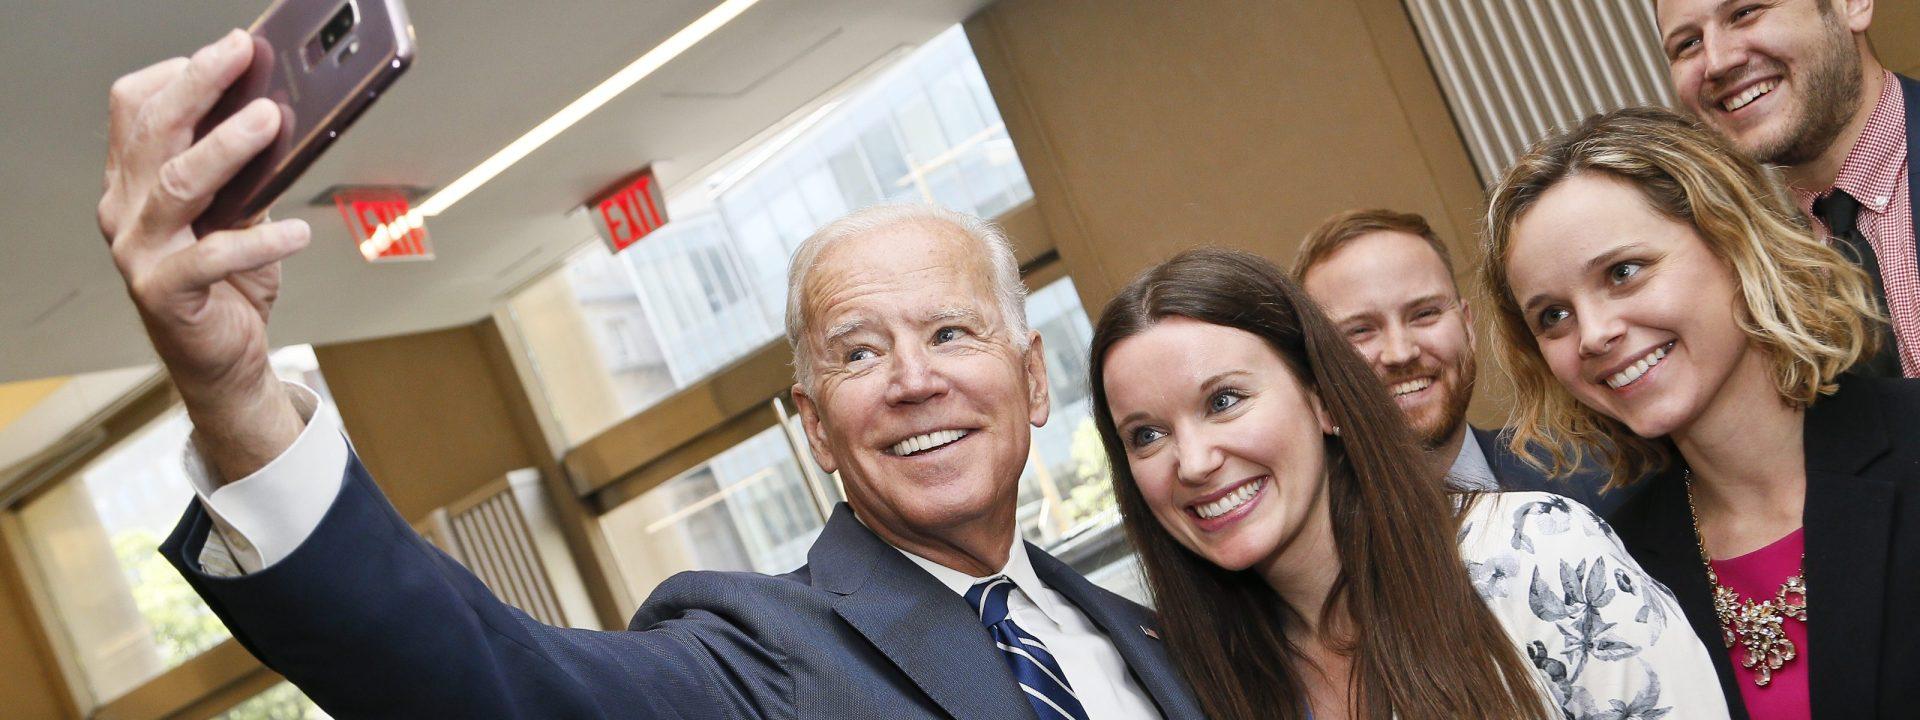 Joe Biden takes a selfie with Brookings staff.